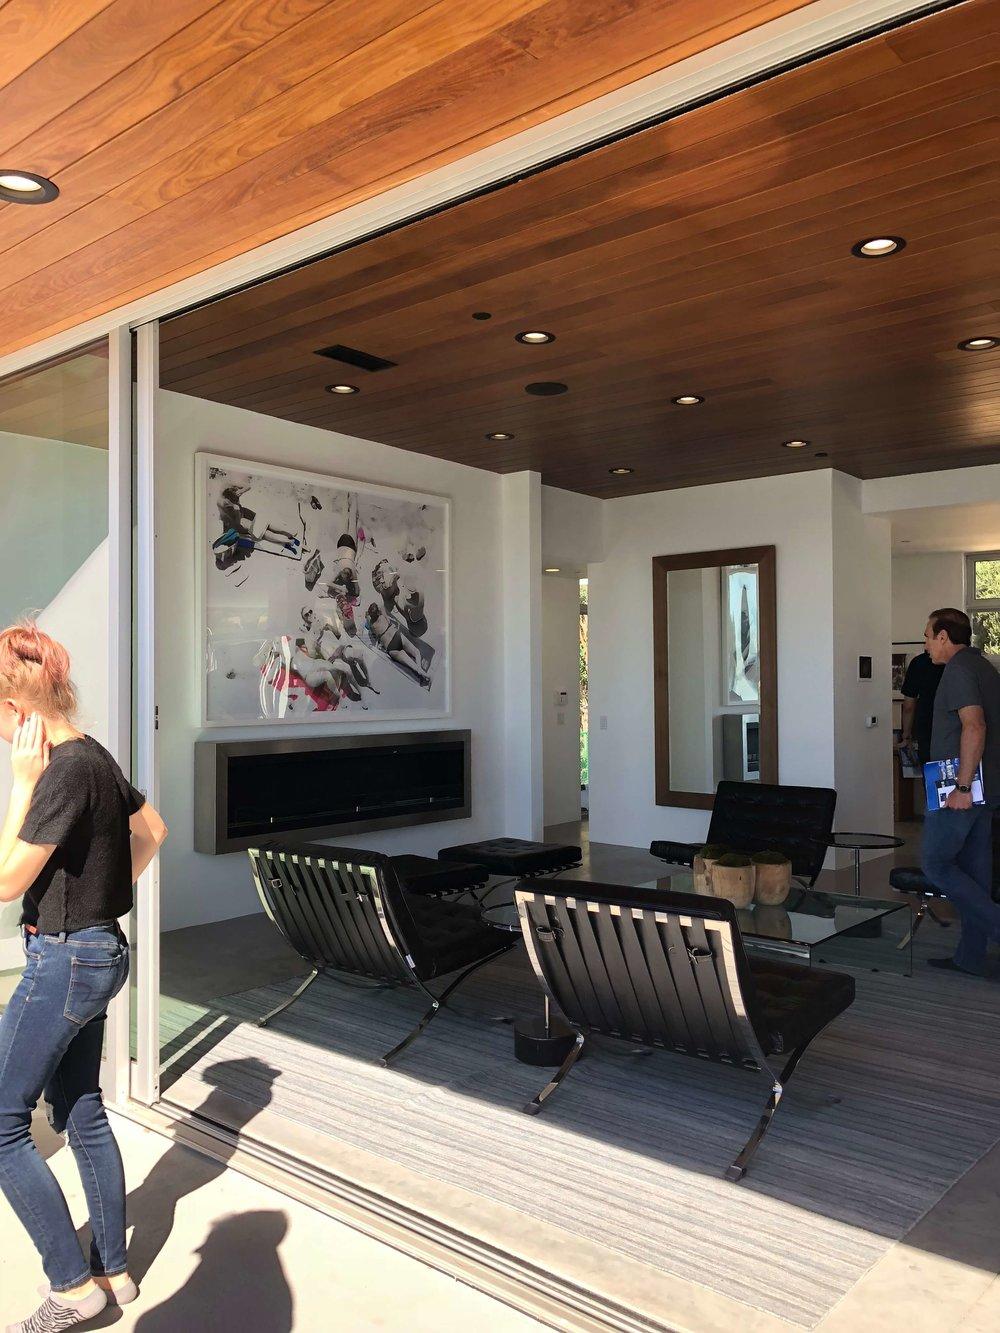 Dwell on Design Malibu Home Tours | Architectural Designer: Vitus Matare #contemporaryarchitecture #slidingglassdoor